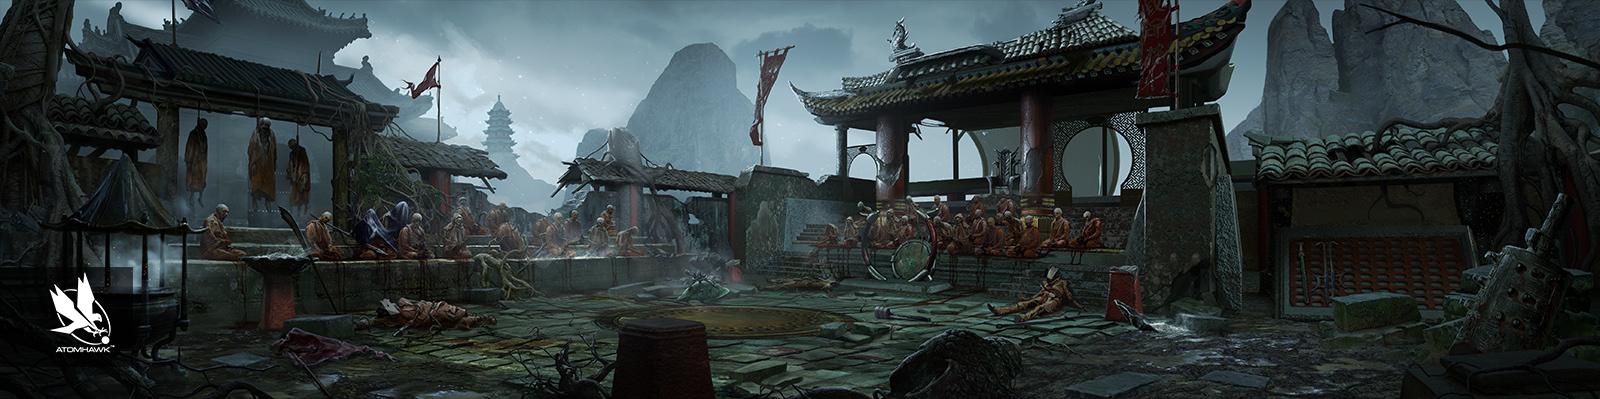 Atomhawk_Warner-Bros-NetherRealm_Mortal-Kombat-11_Concept-Art_Environment-Design_Shang-Tsung's-Courtyard.jpg